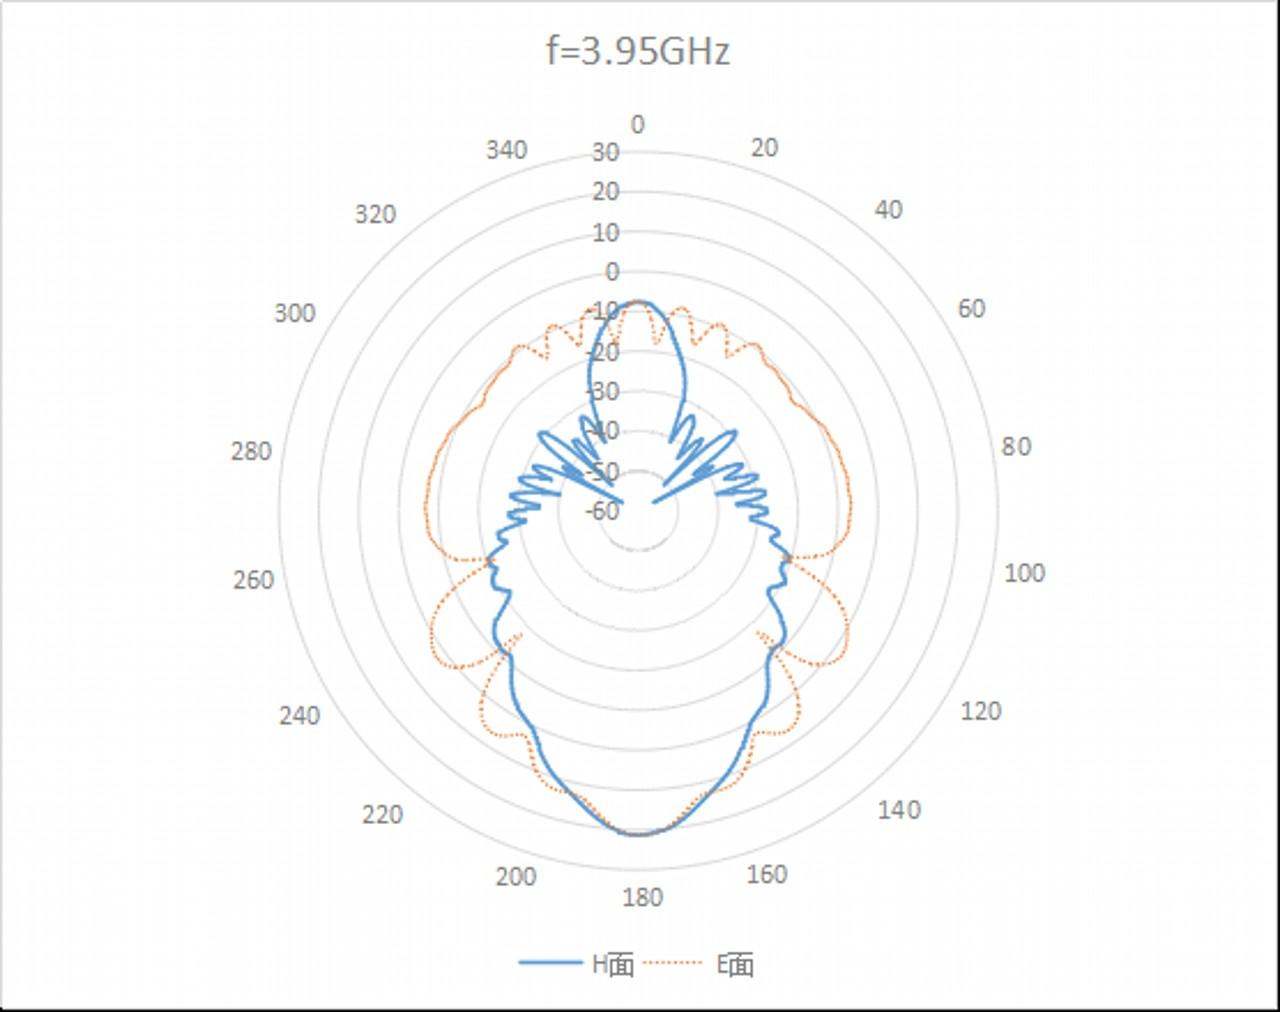 WR-284 Waveguide Standard Gain Horn Antenna. Nominal Gain: 20 dBi Gain. Frequency Range: 2.6 GHz to 4 GHz - 2